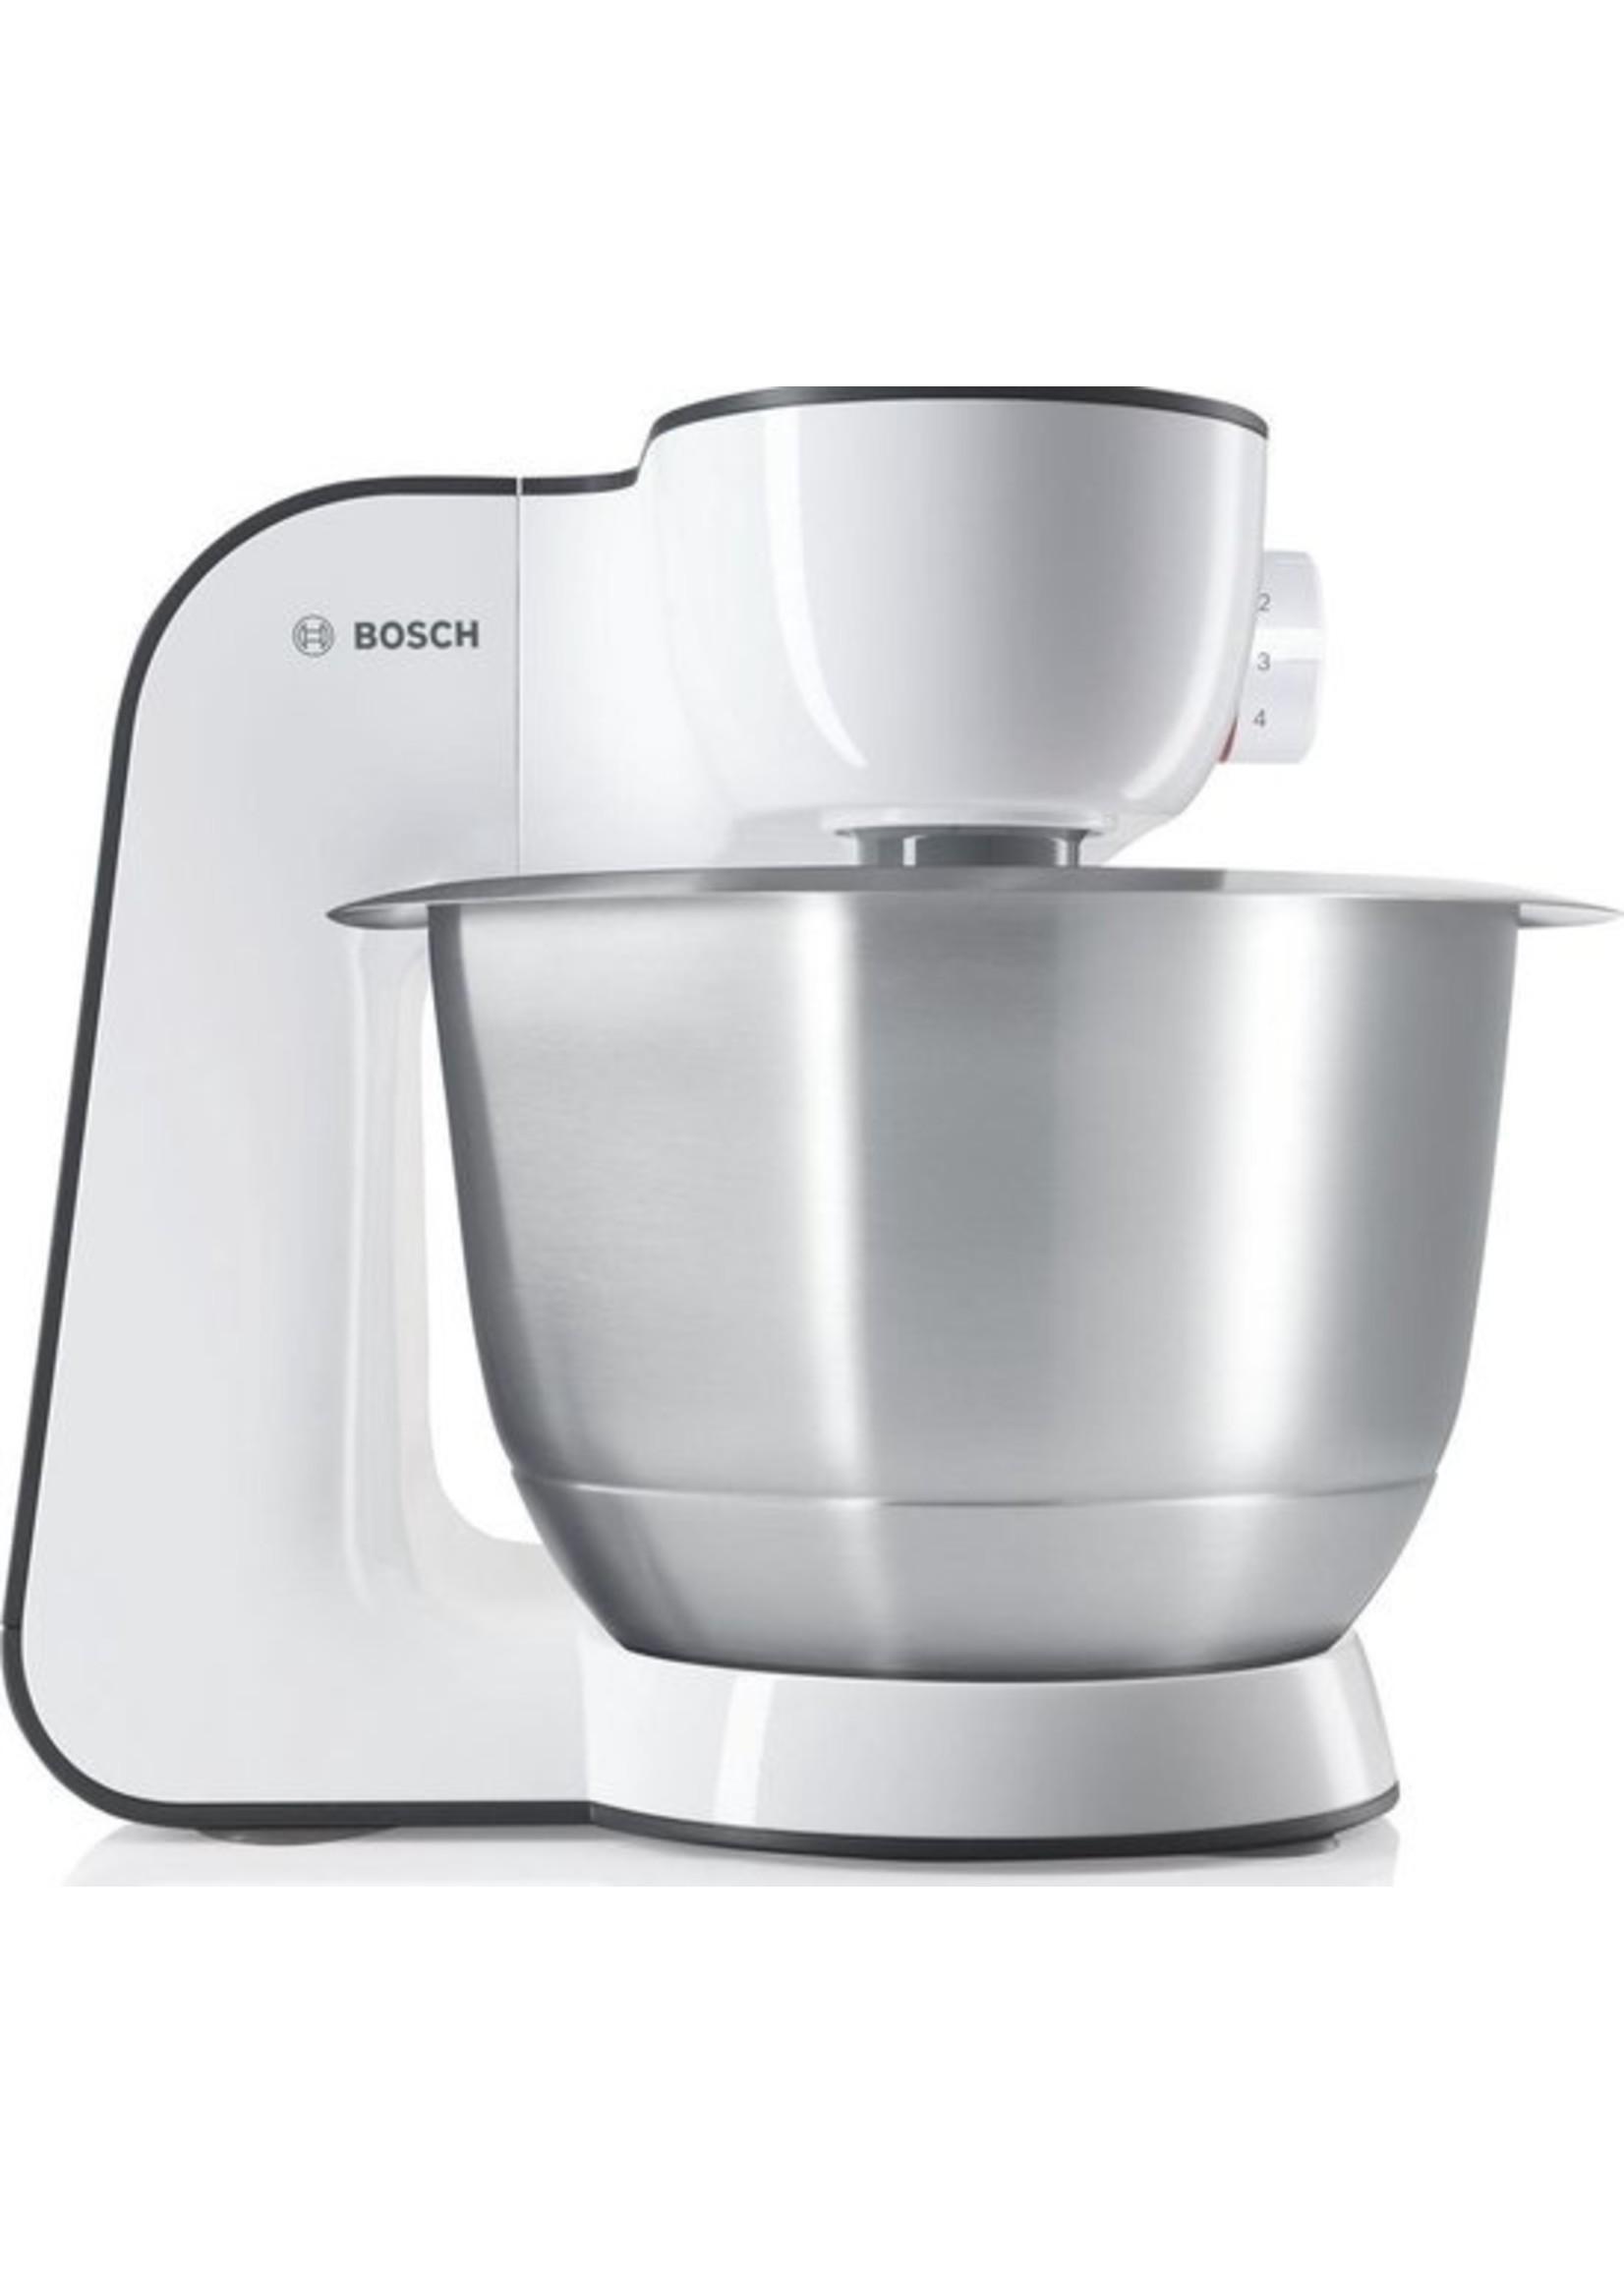 Bosch Bosch MUM5 StartLine MUM54A00-  Keukenmachine - Wit zwart koopjeshoek